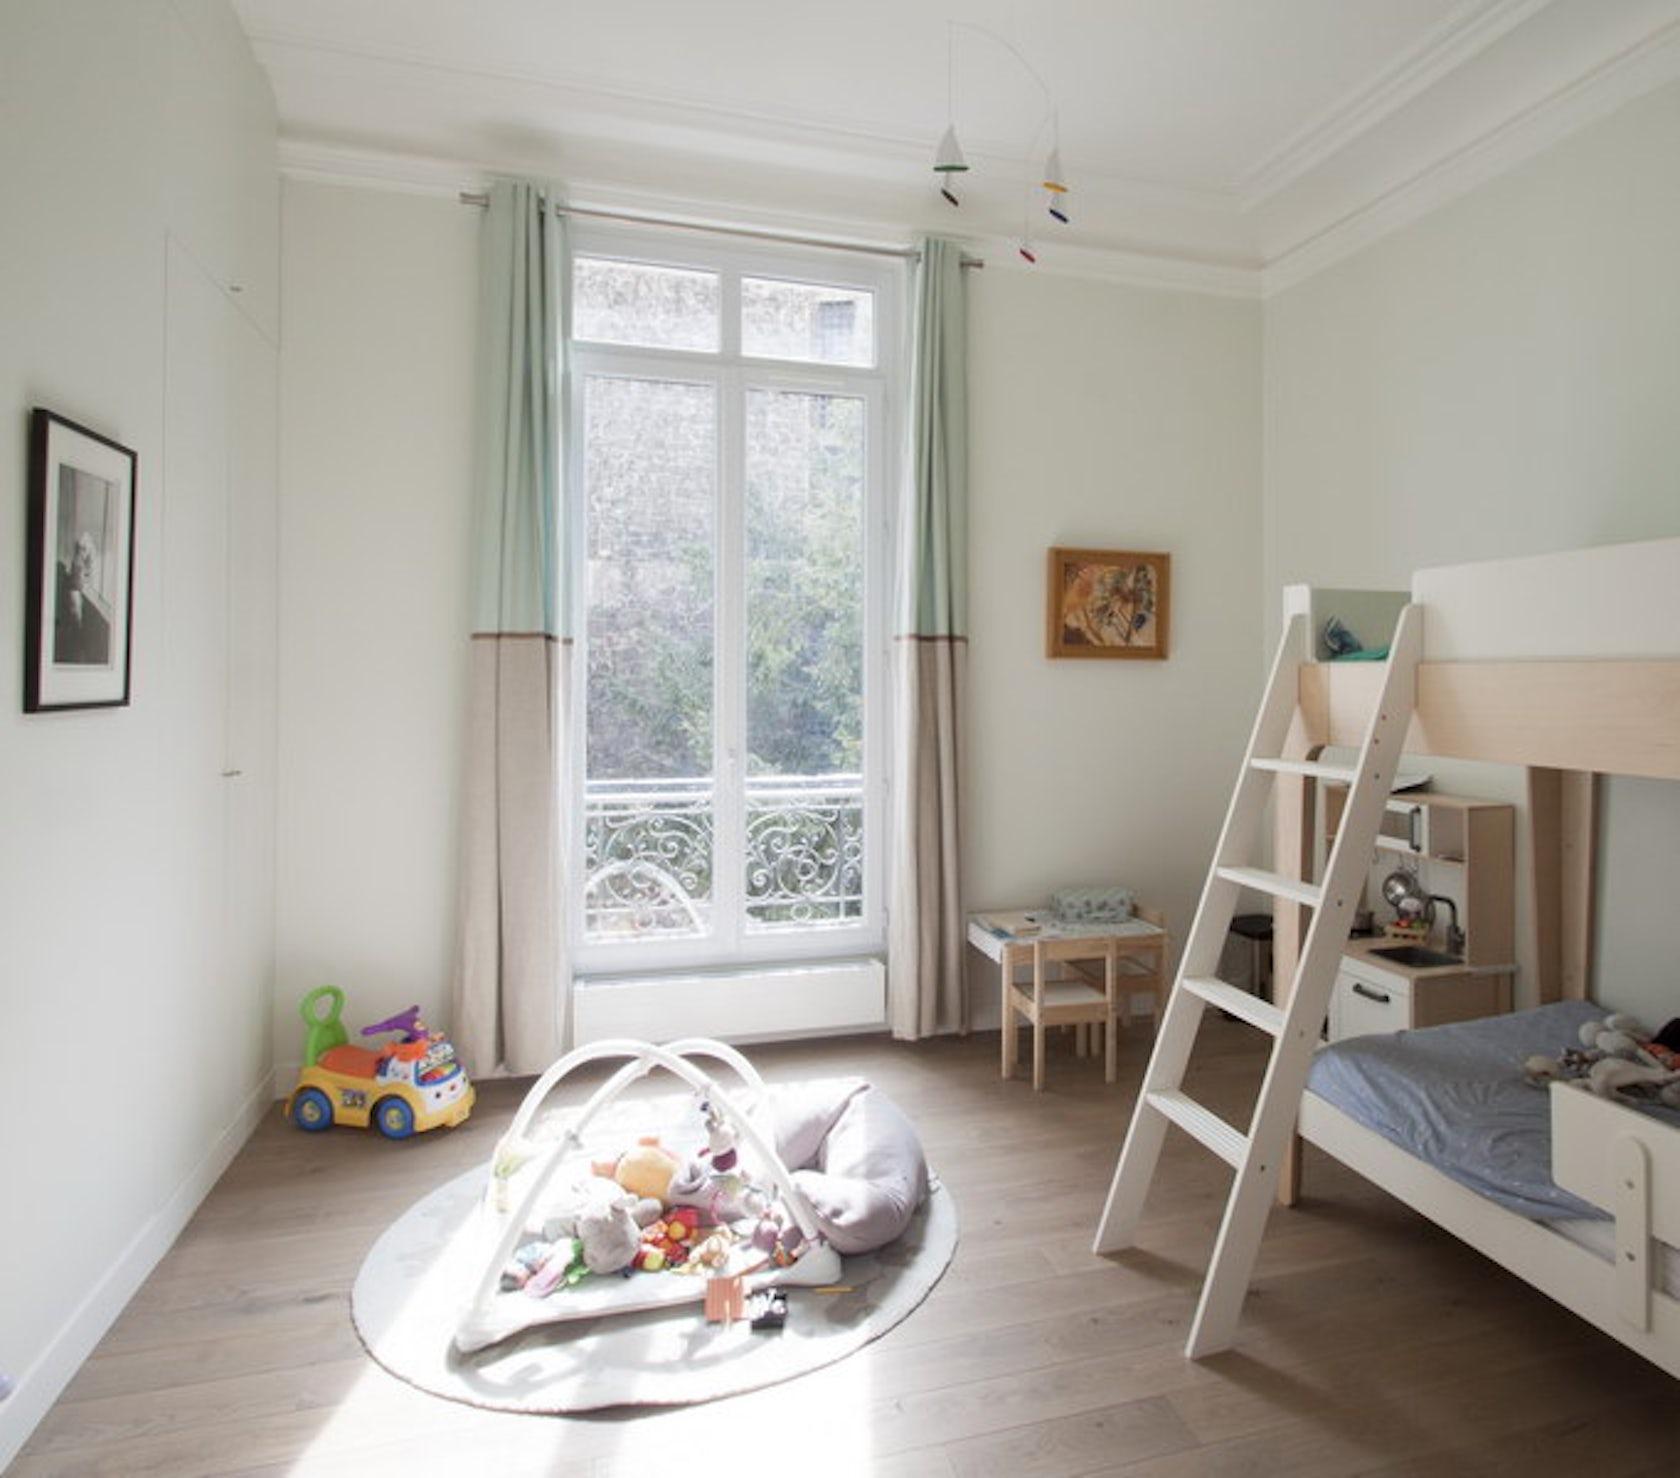 amsterdam apartment architizer. Black Bedroom Furniture Sets. Home Design Ideas